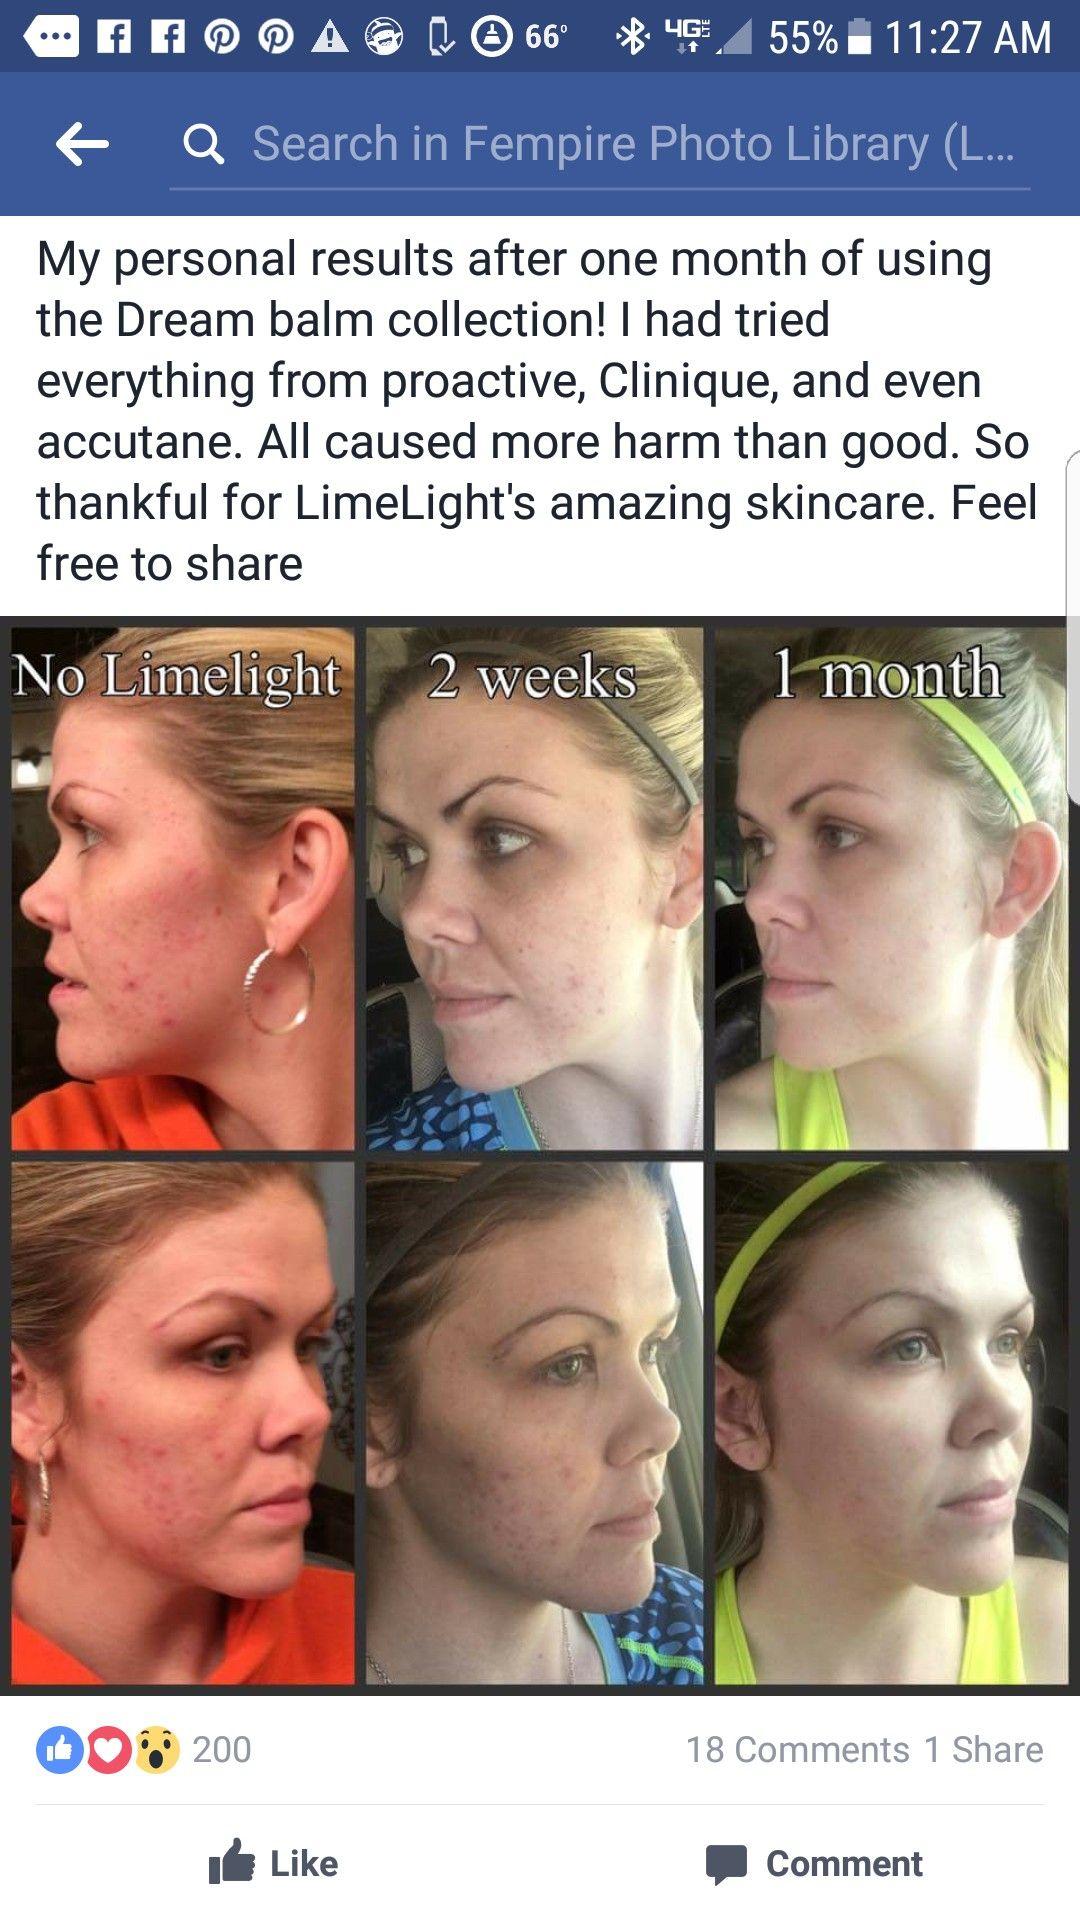 Our dream cream kit. Awesome results! 1 week time. Phanessa30@yahoo.com Www.limelightbyalcone.com/vanessak.  #acnecure #acnecream #facecream #pimplecream #acne #cream #face #results #reddness